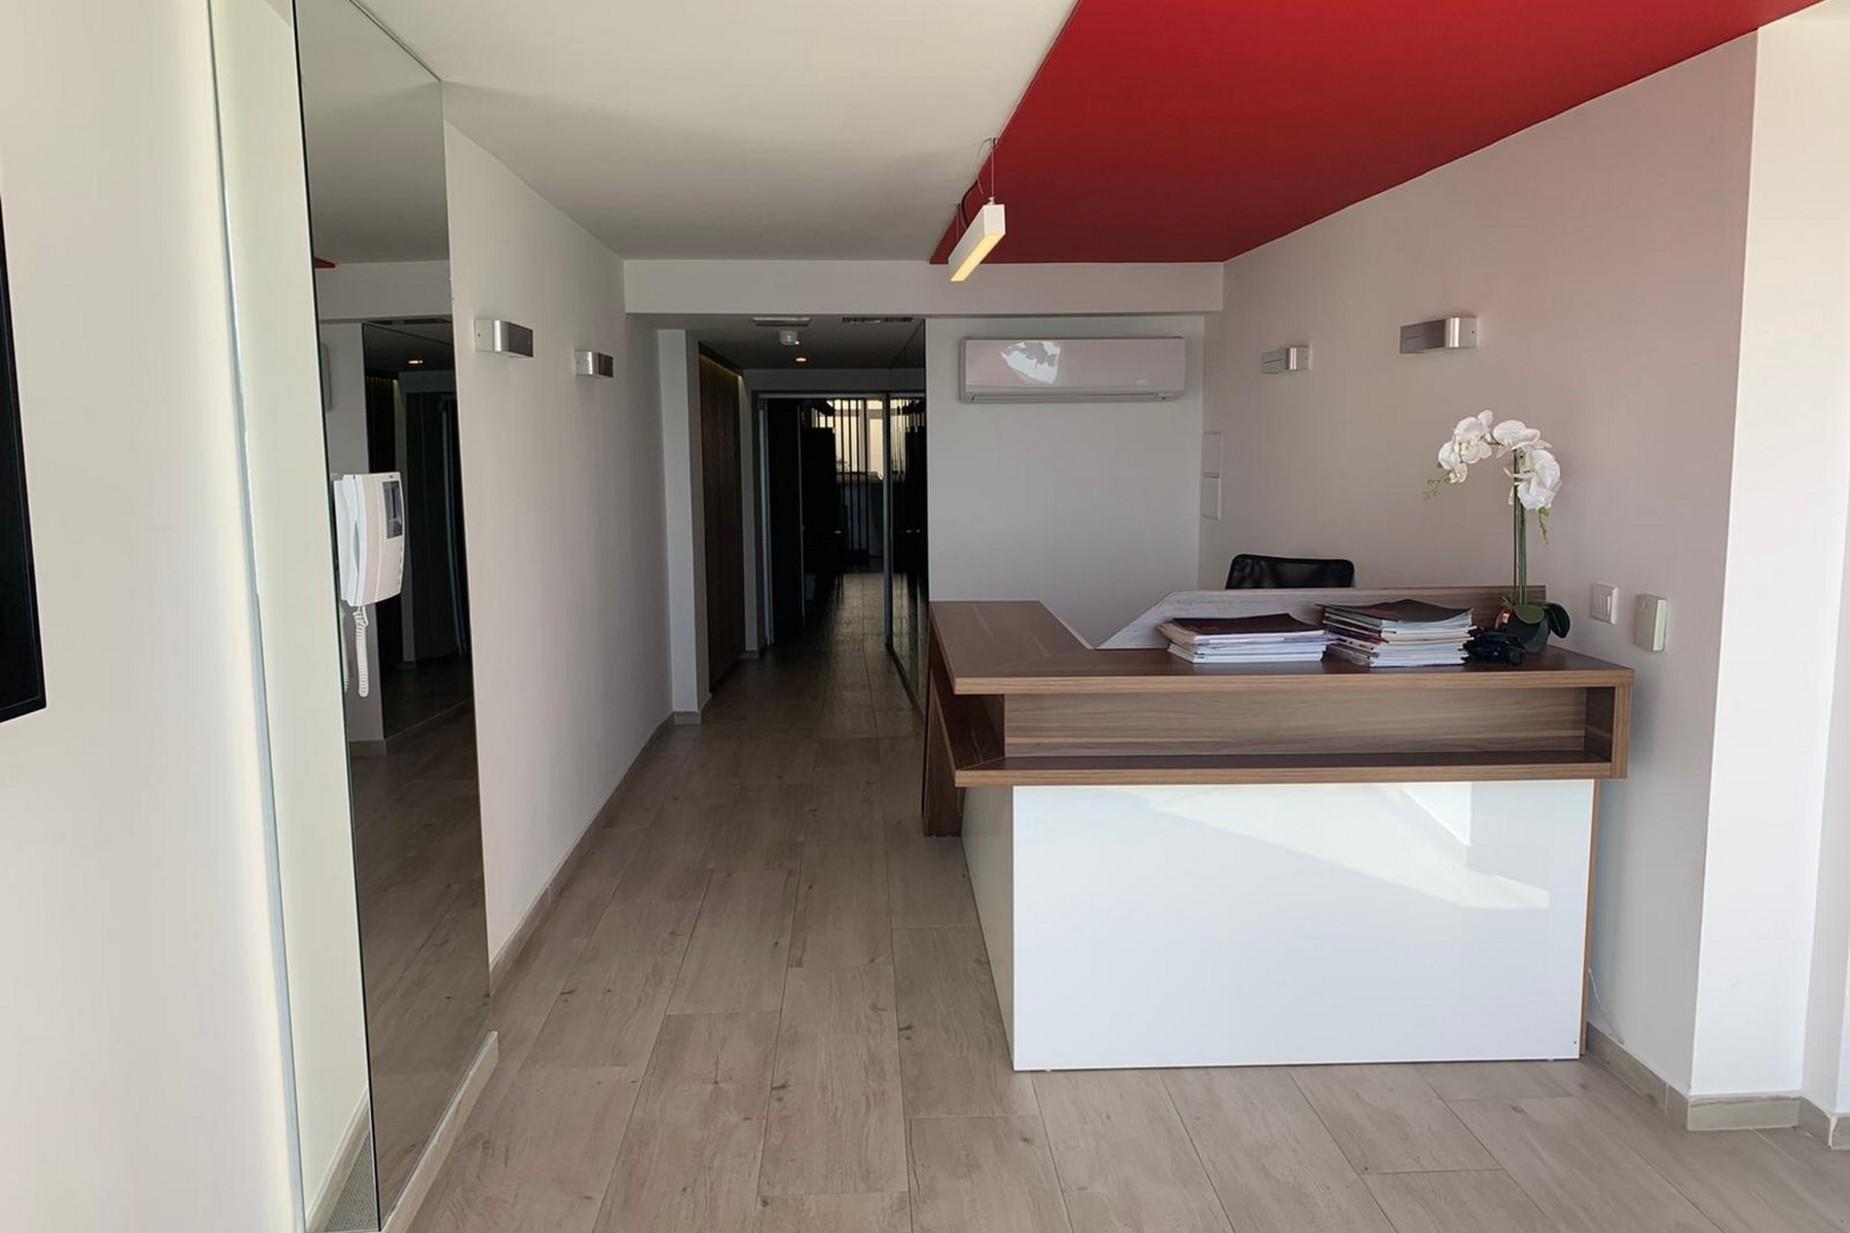 0 bed Office For Rent in Gzira, Gzira - thumb 2